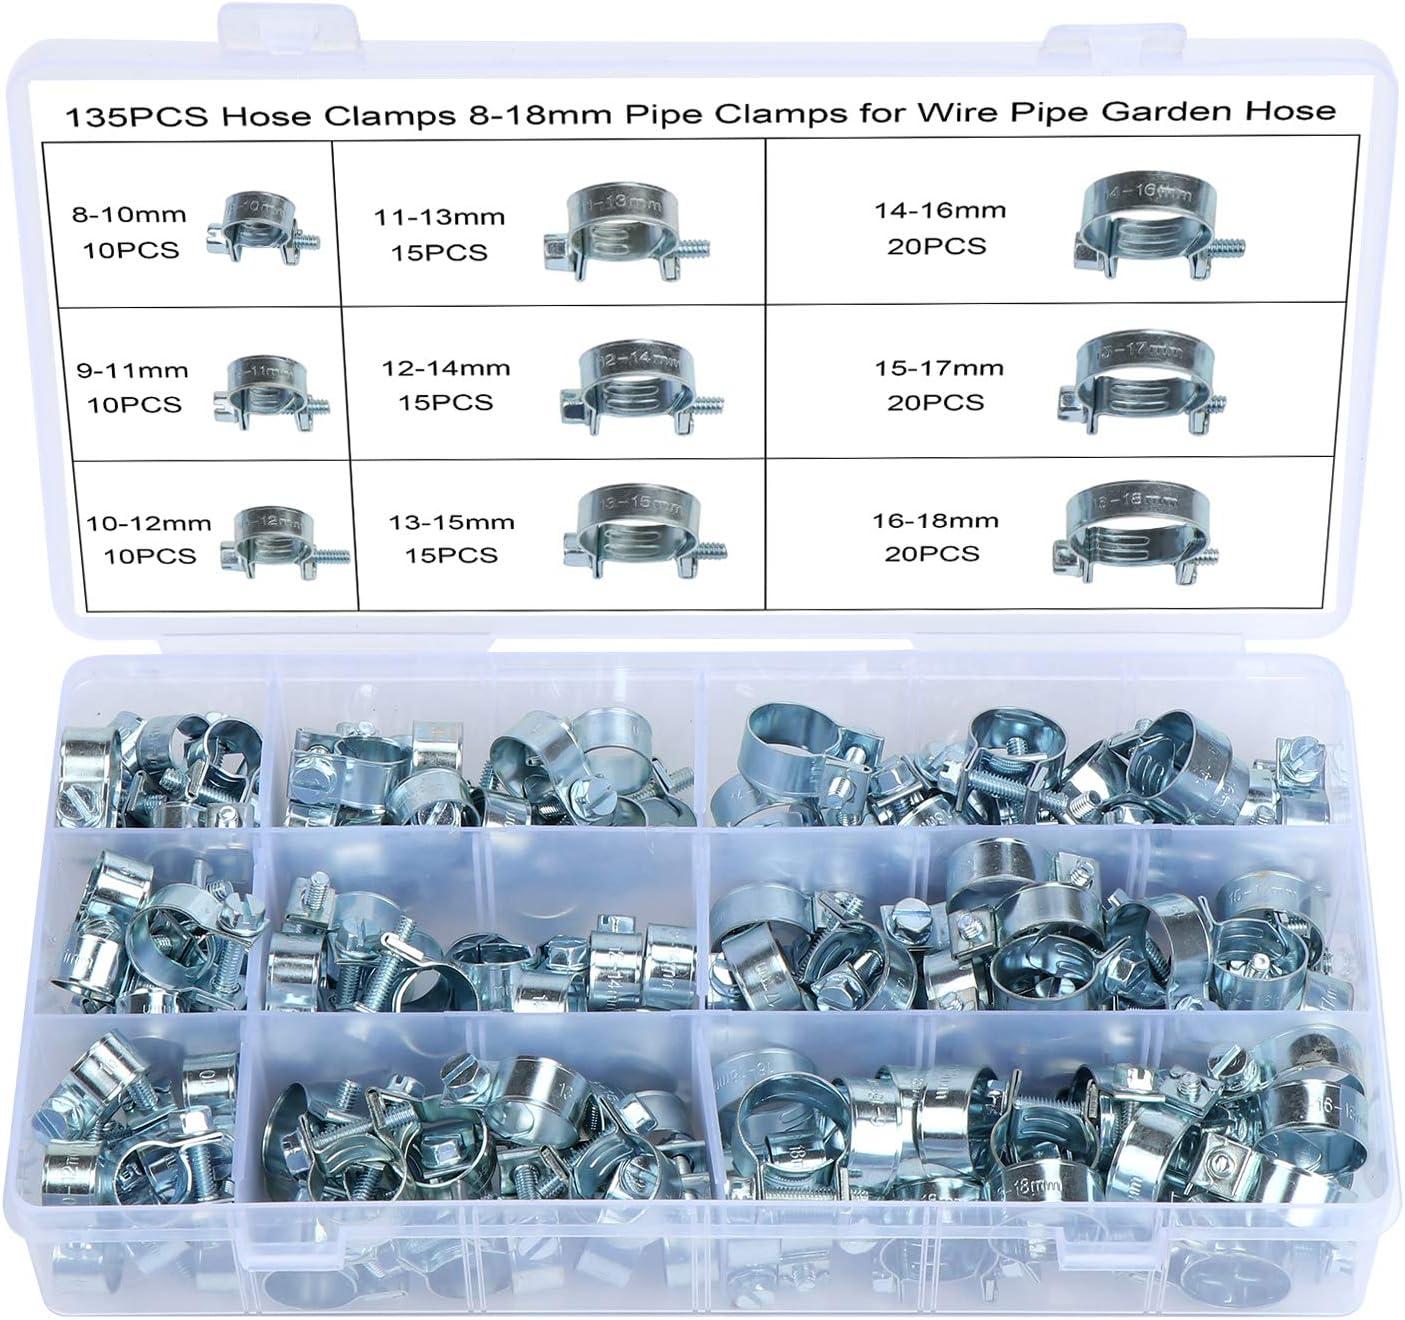 20 PCS 16-18mm FUEL INJECTION HOSE CLAMP AUTO Fuel clamps